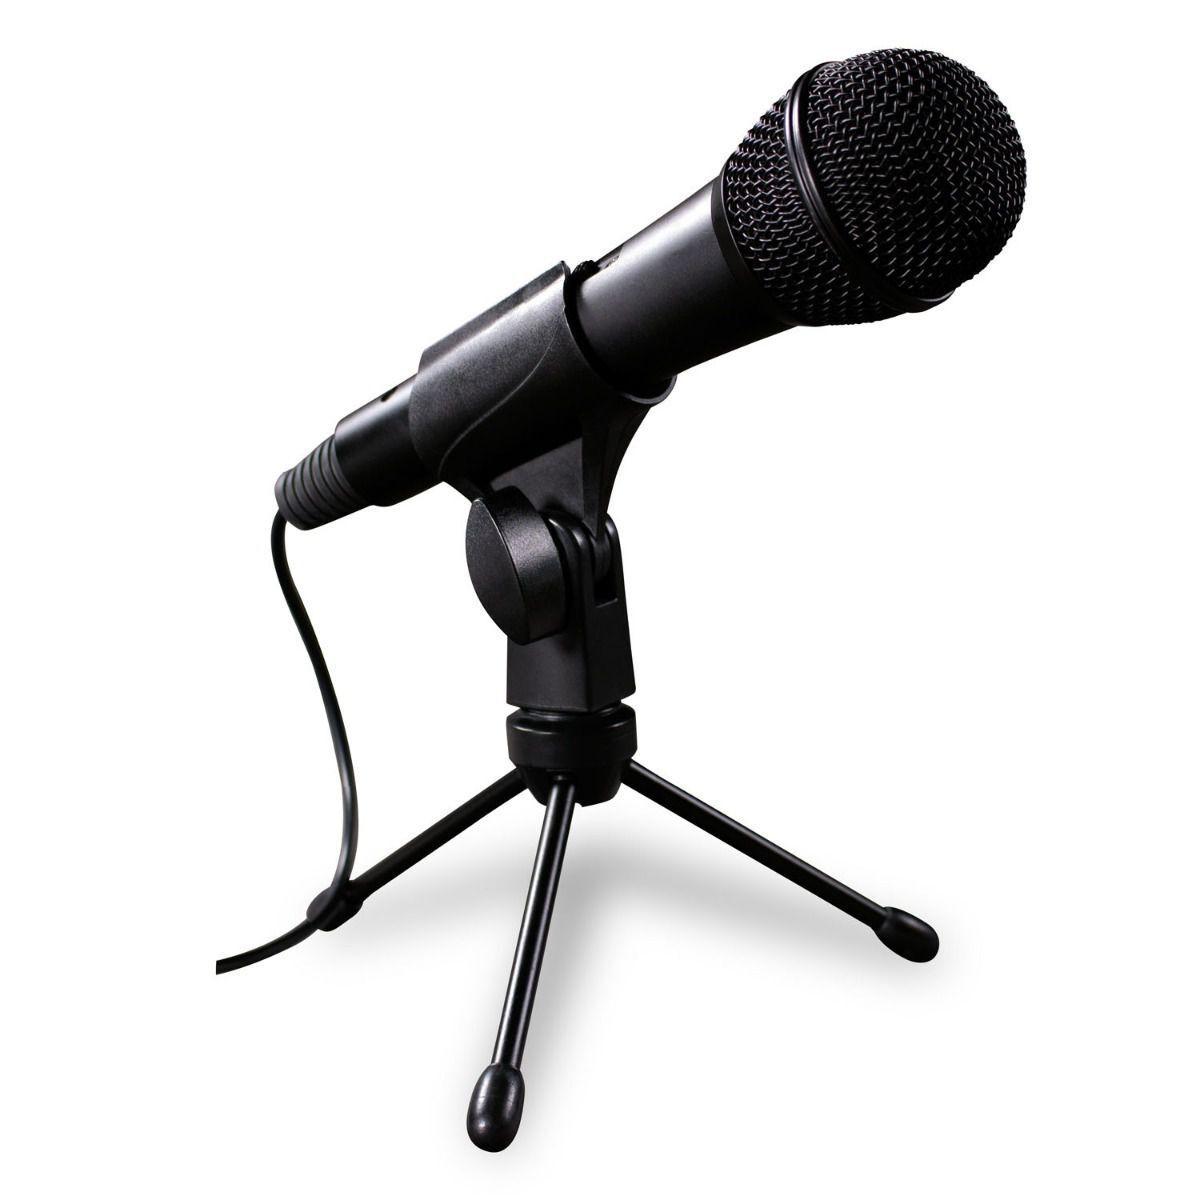 Microfone Condensador para PC gravar vídeo Youtuber Knup KP-918